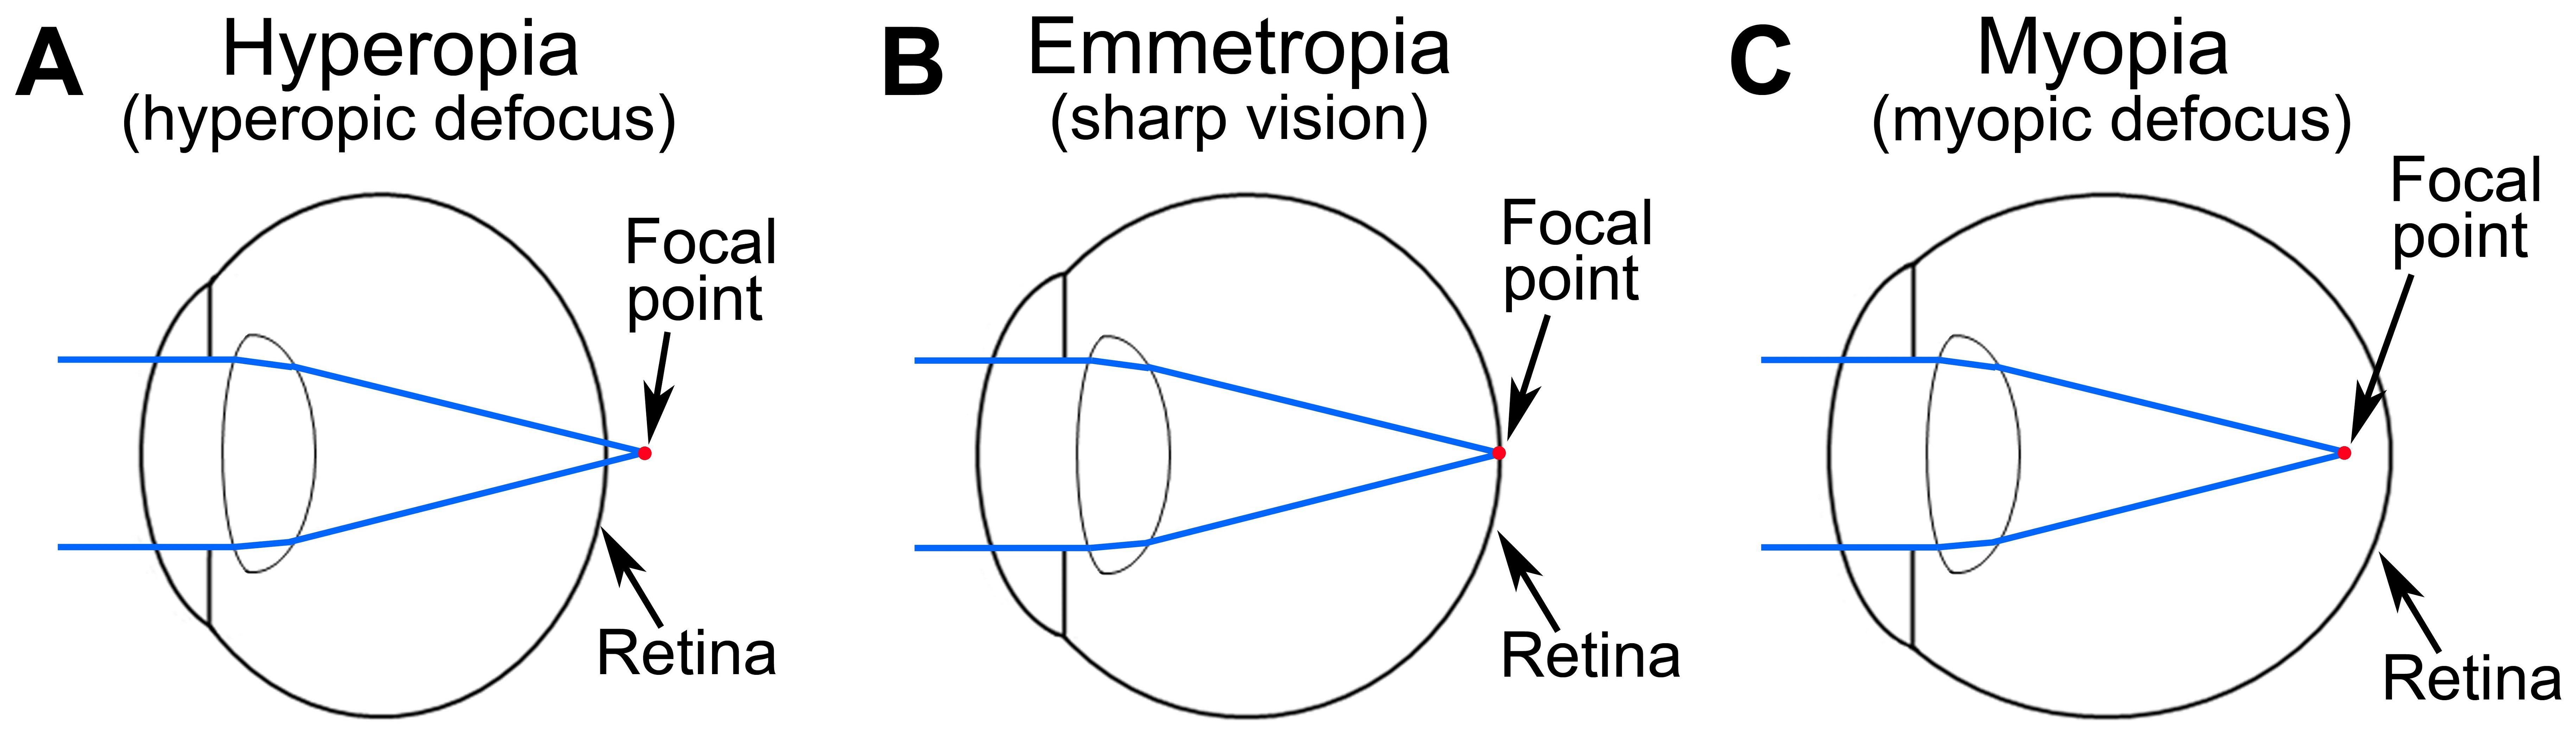 Hyperopia - Back To Basics